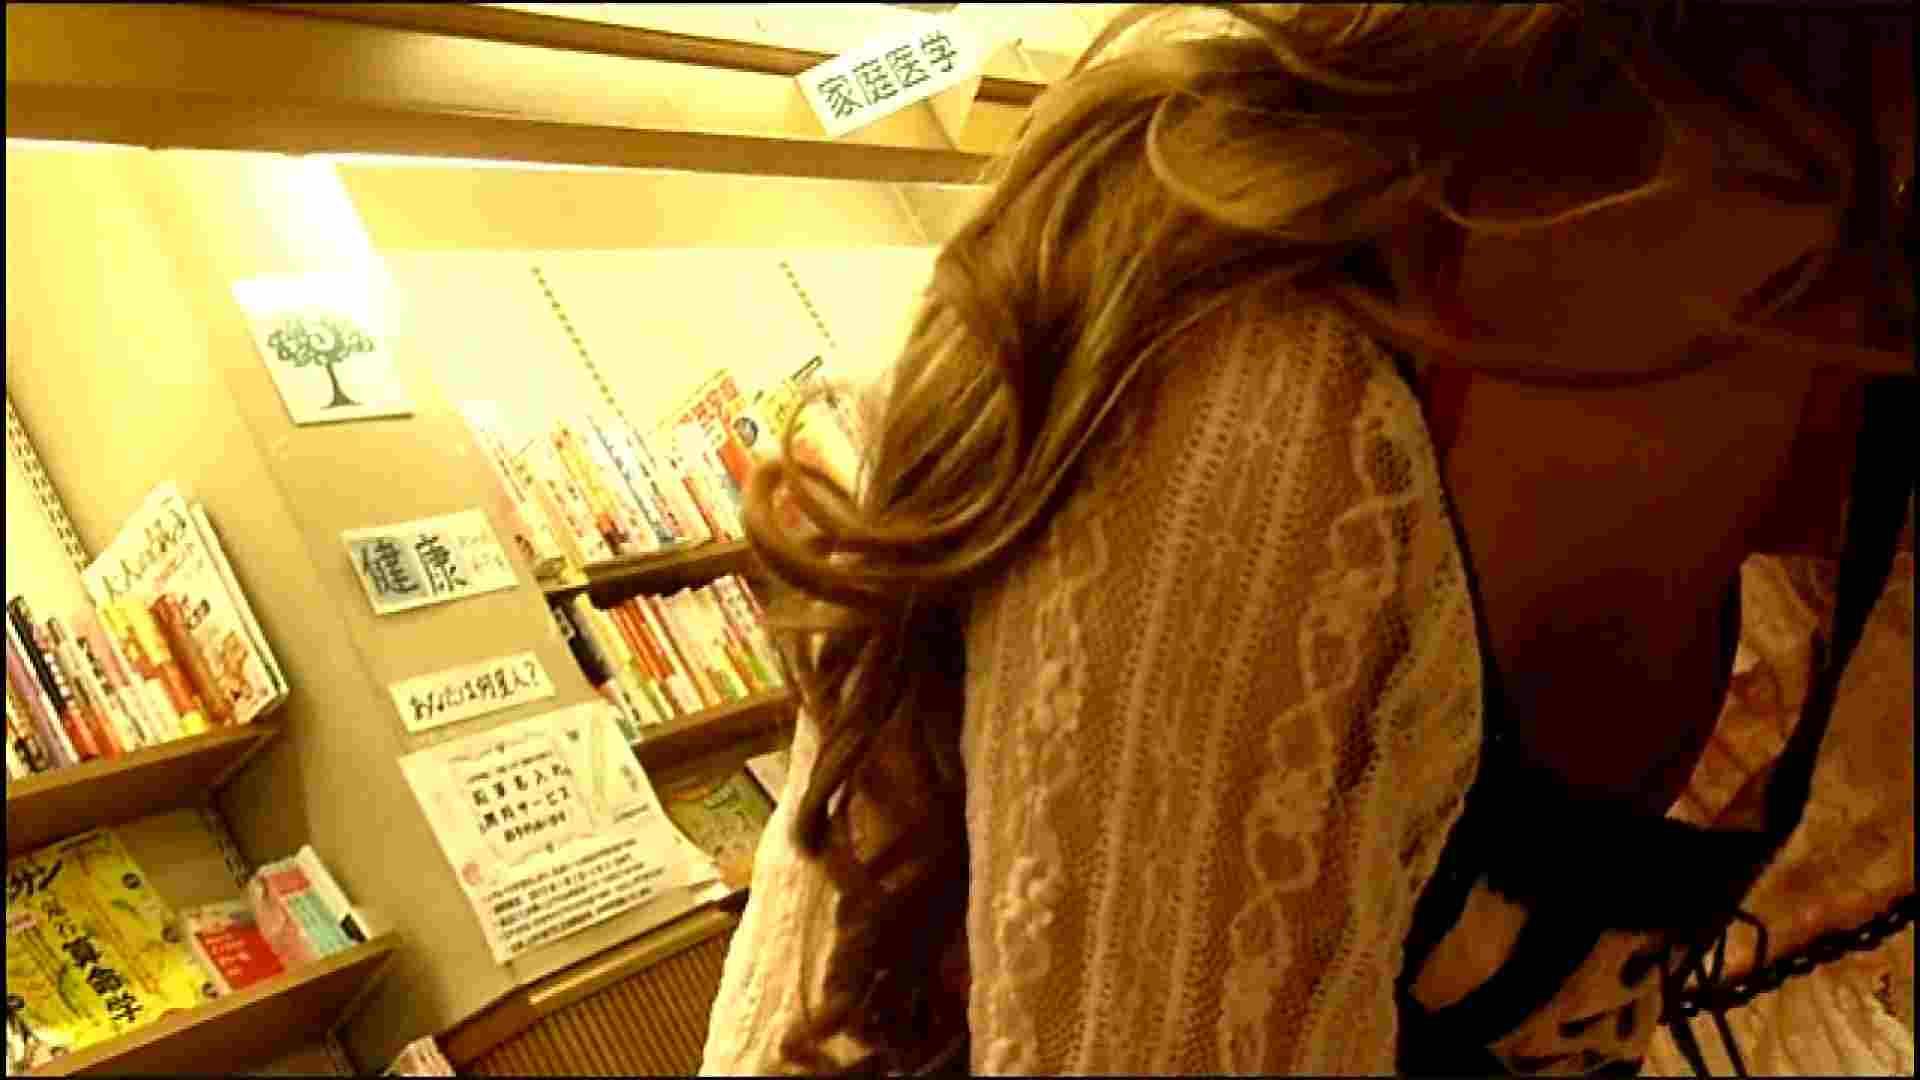 NO.2 本屋にいた巨乳ギャル 胸チラ・のぞき ぱこり動画紹介 95枚 11